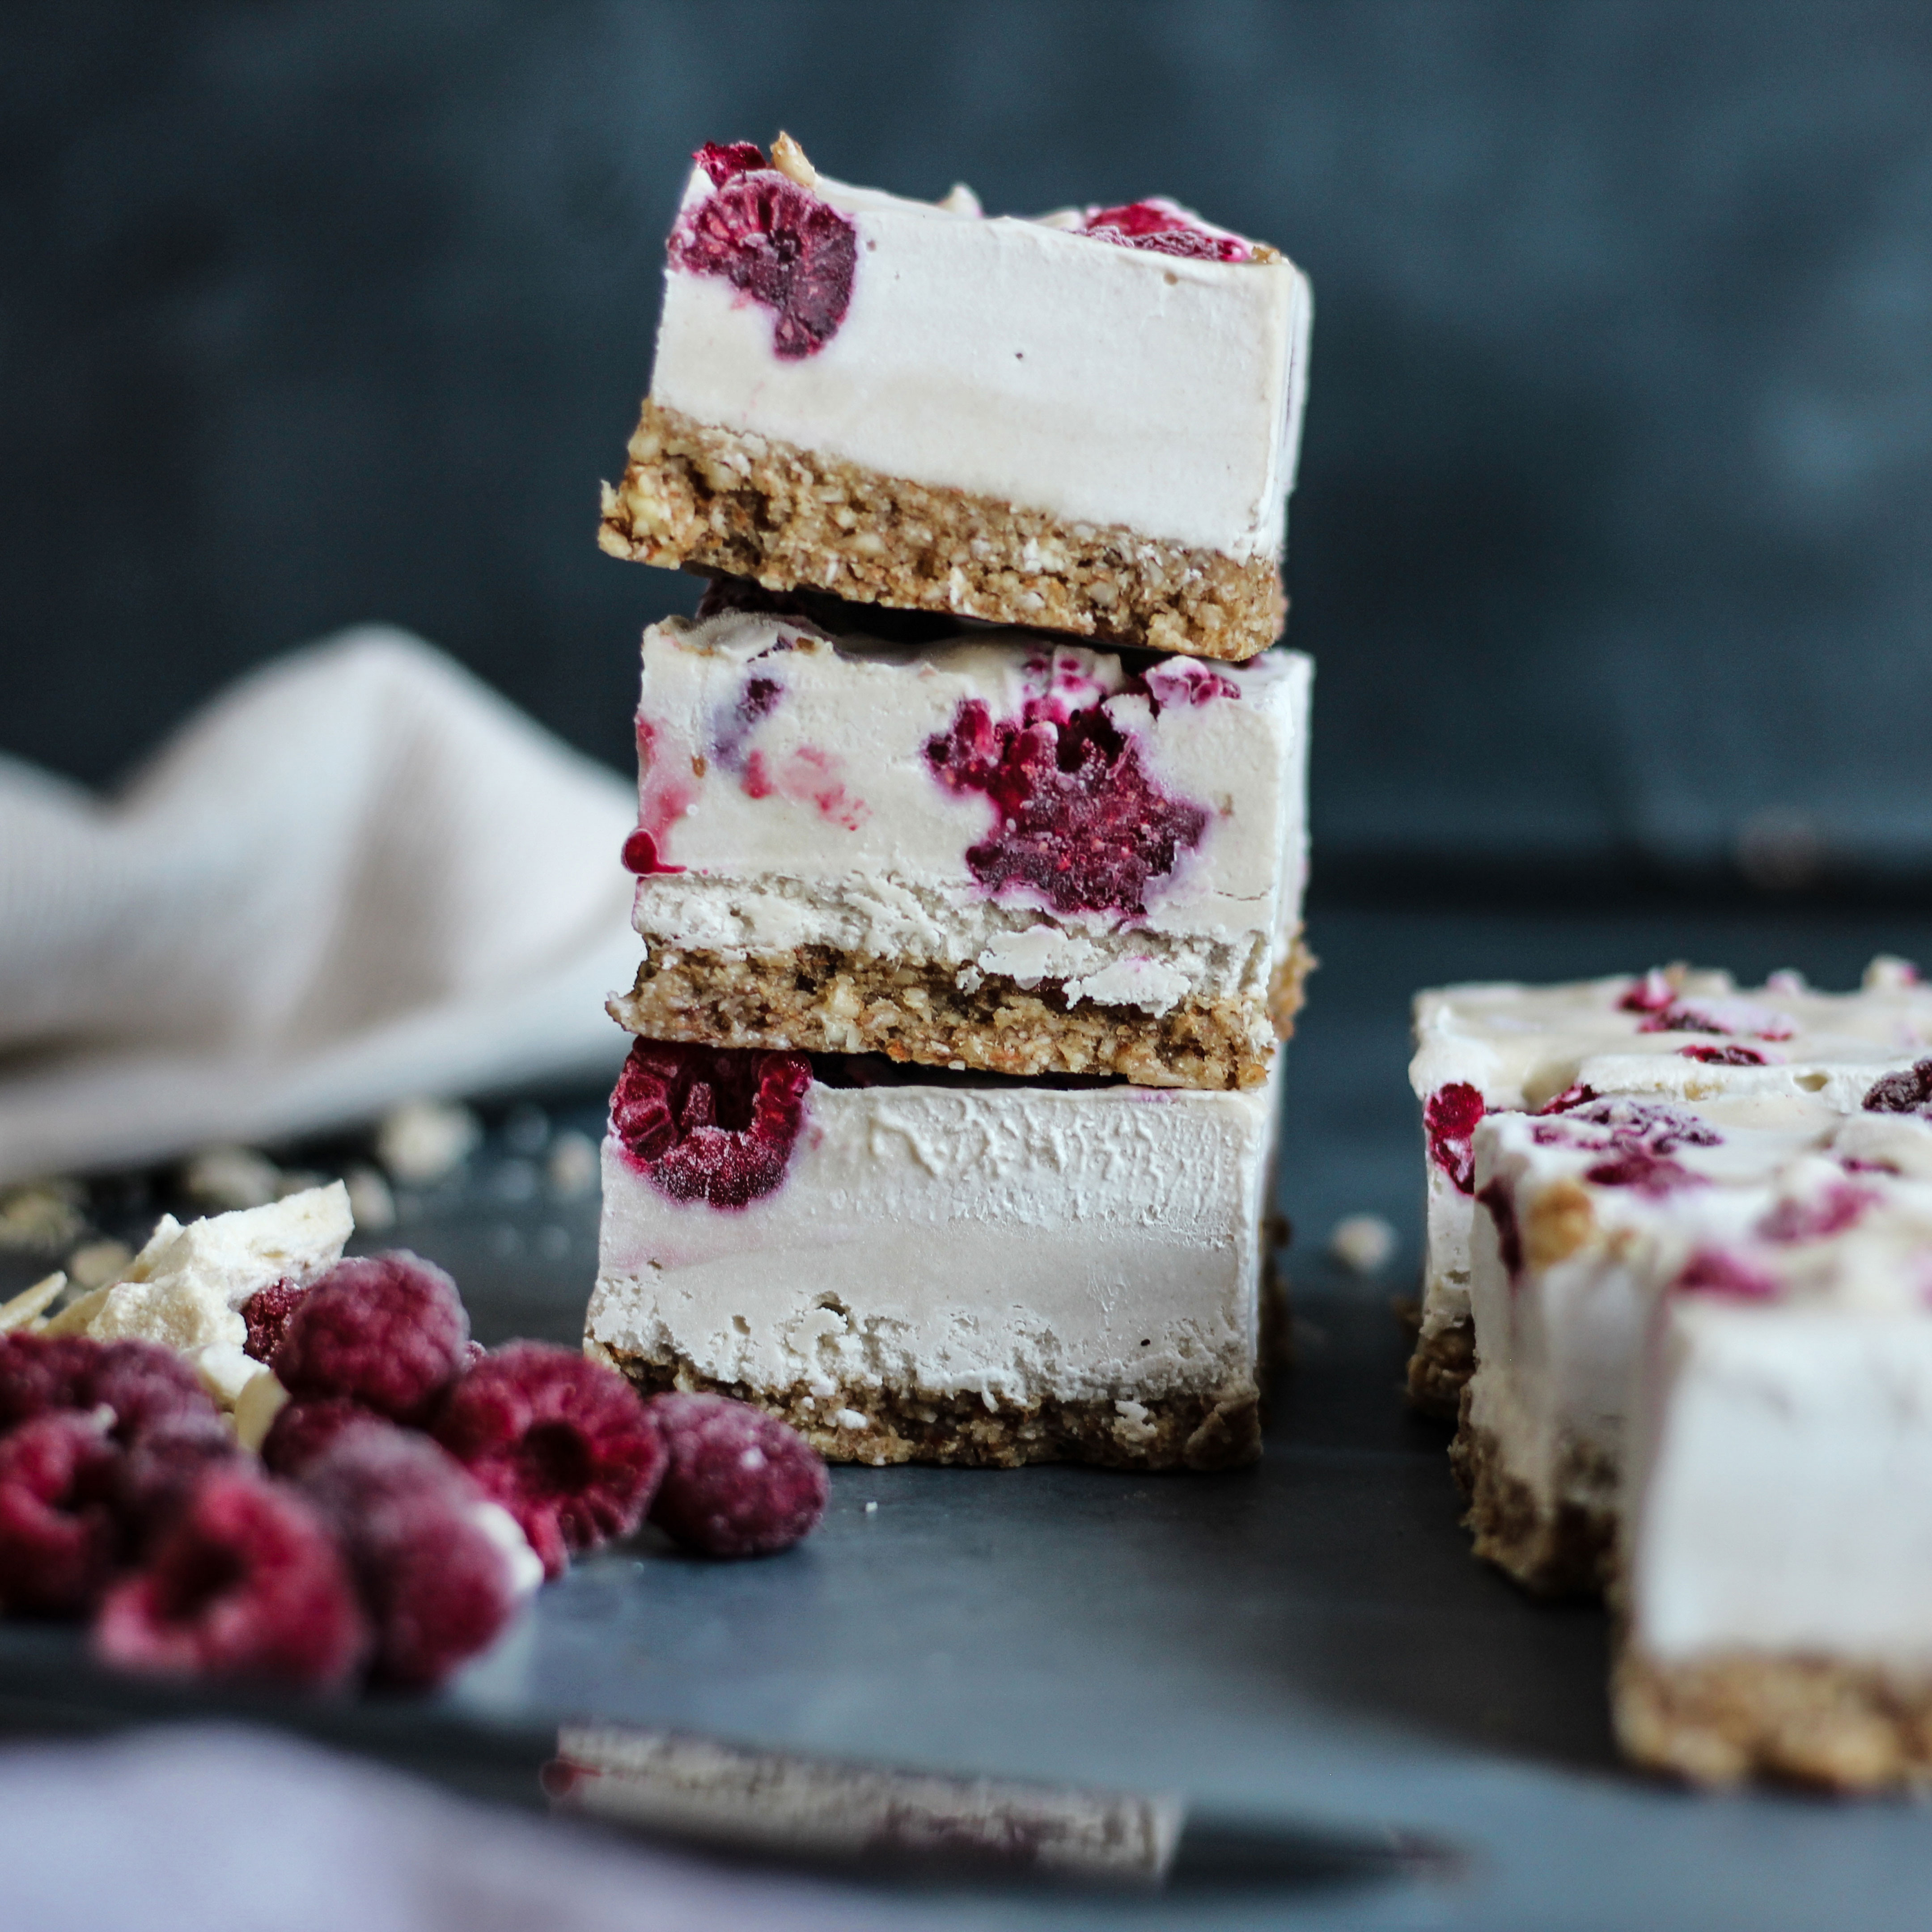 Raw Vegan Desserts  Sam Murphy s raw vegan desserts from So Beautifully Real